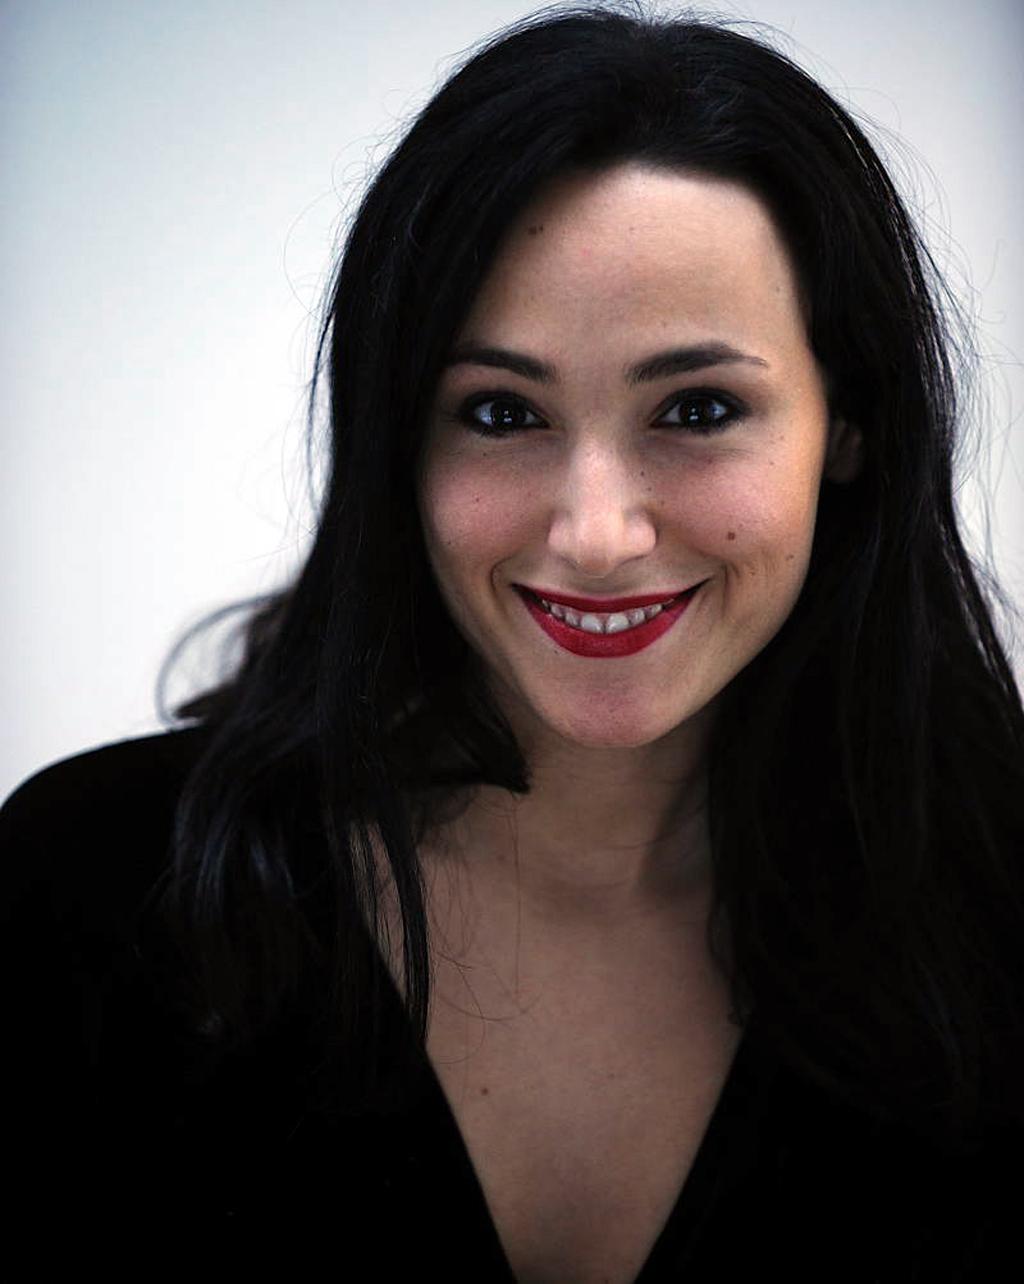 arijana-robert-schultze-2011-09